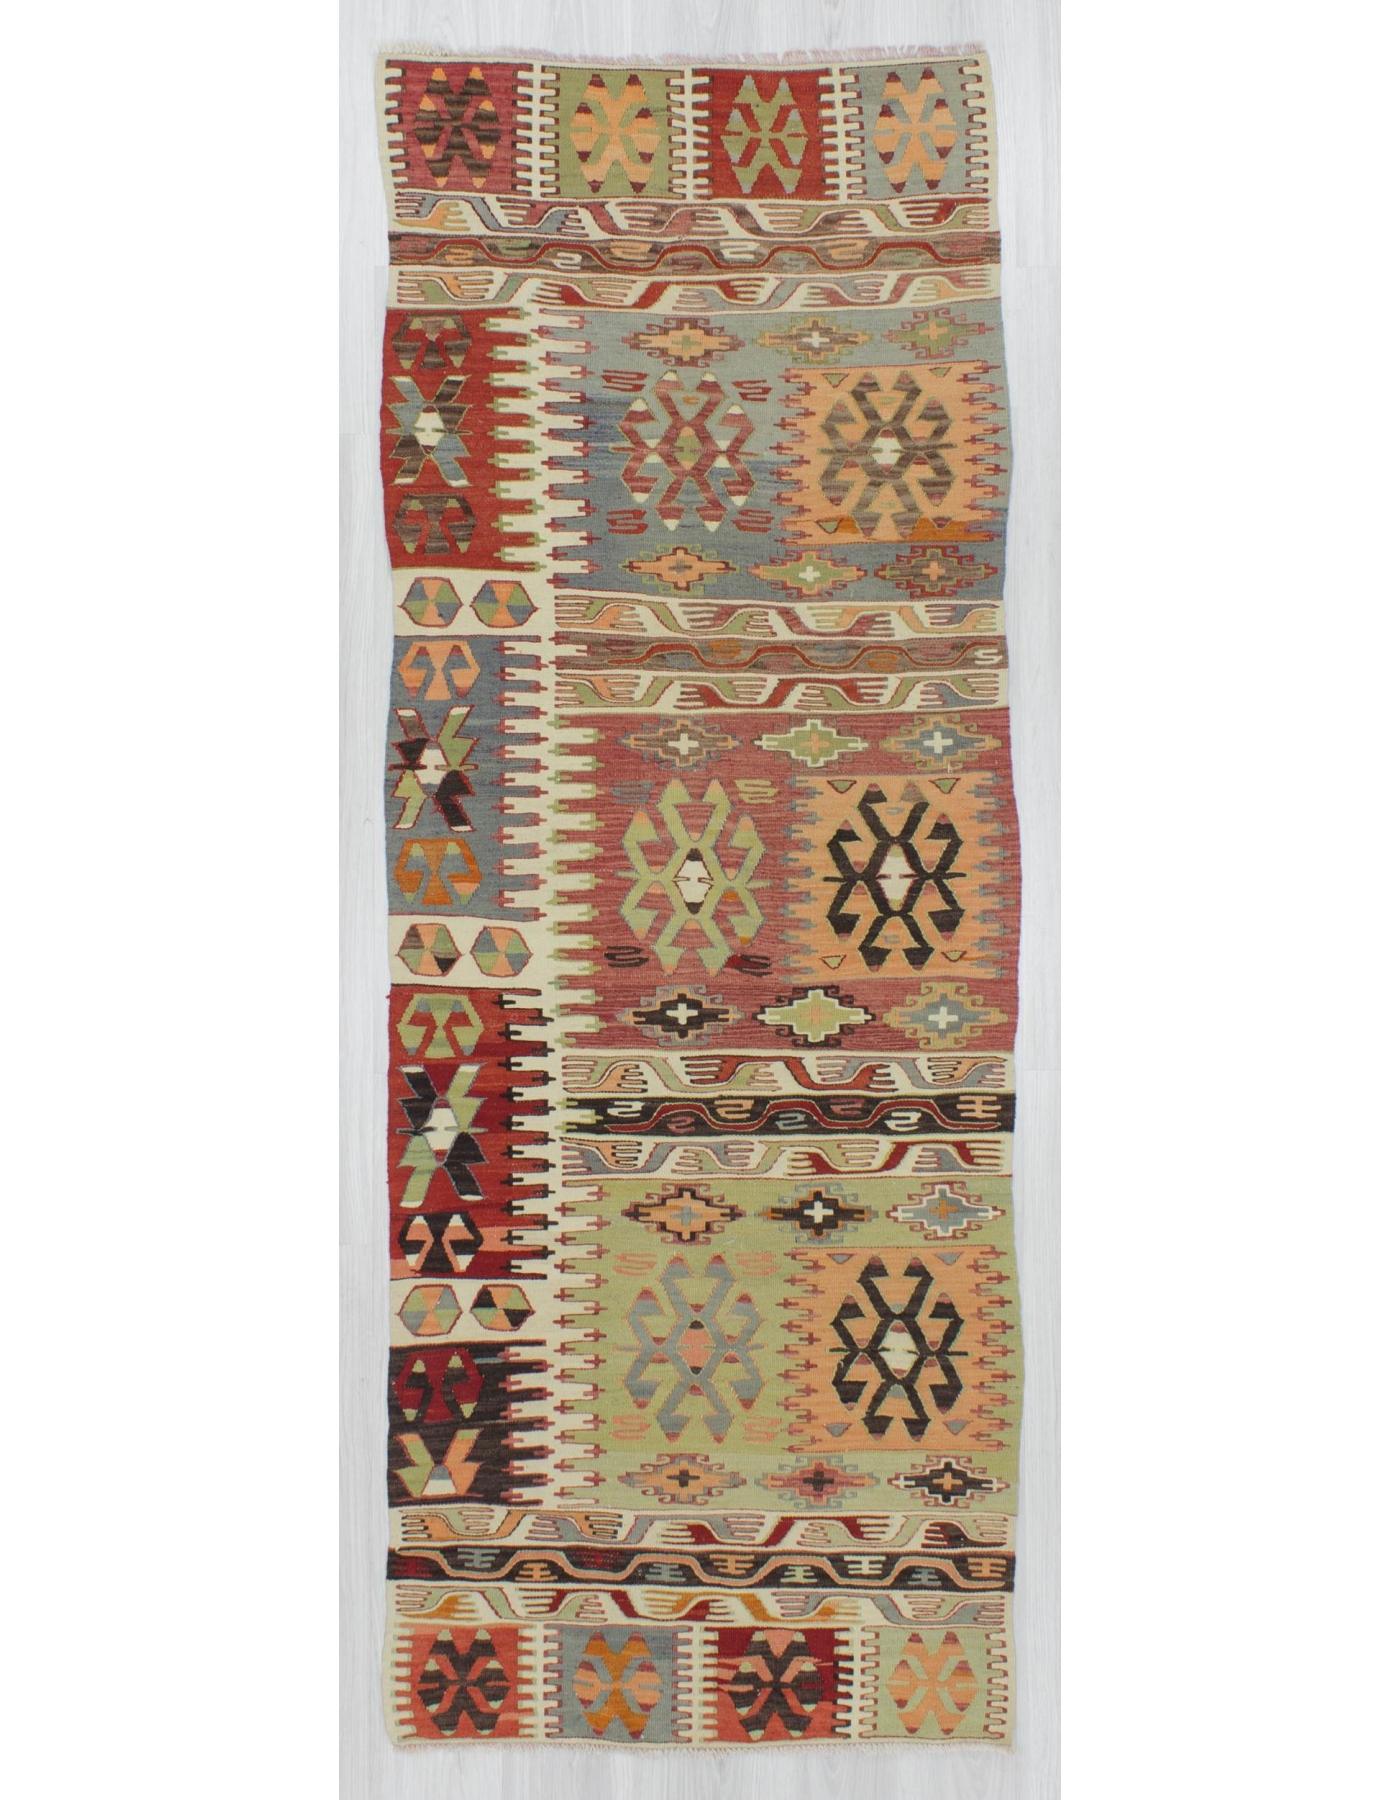 Vintage Decorative Turkish Kilim Runner Rug